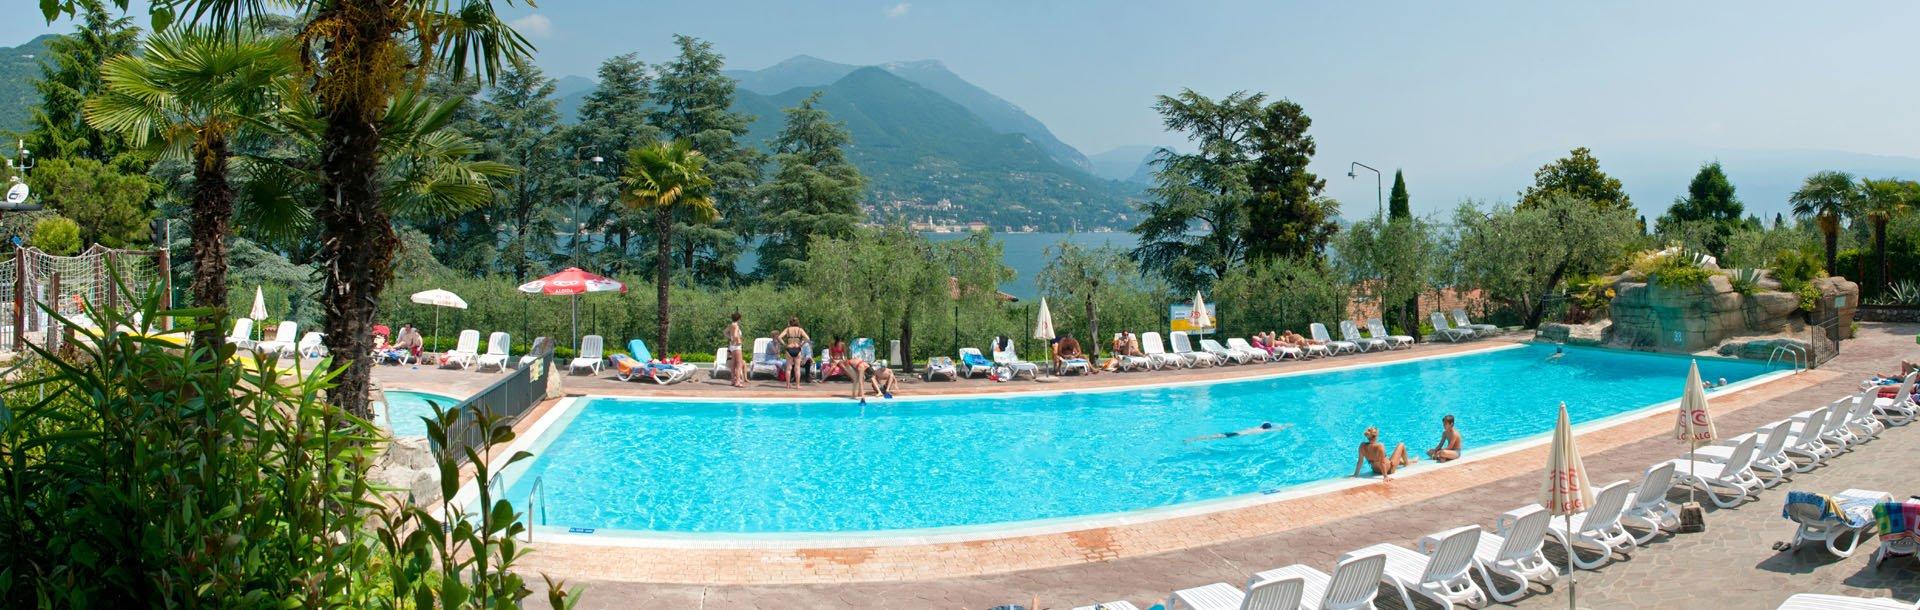 Campingplatz Eden, Gardasee, Italien